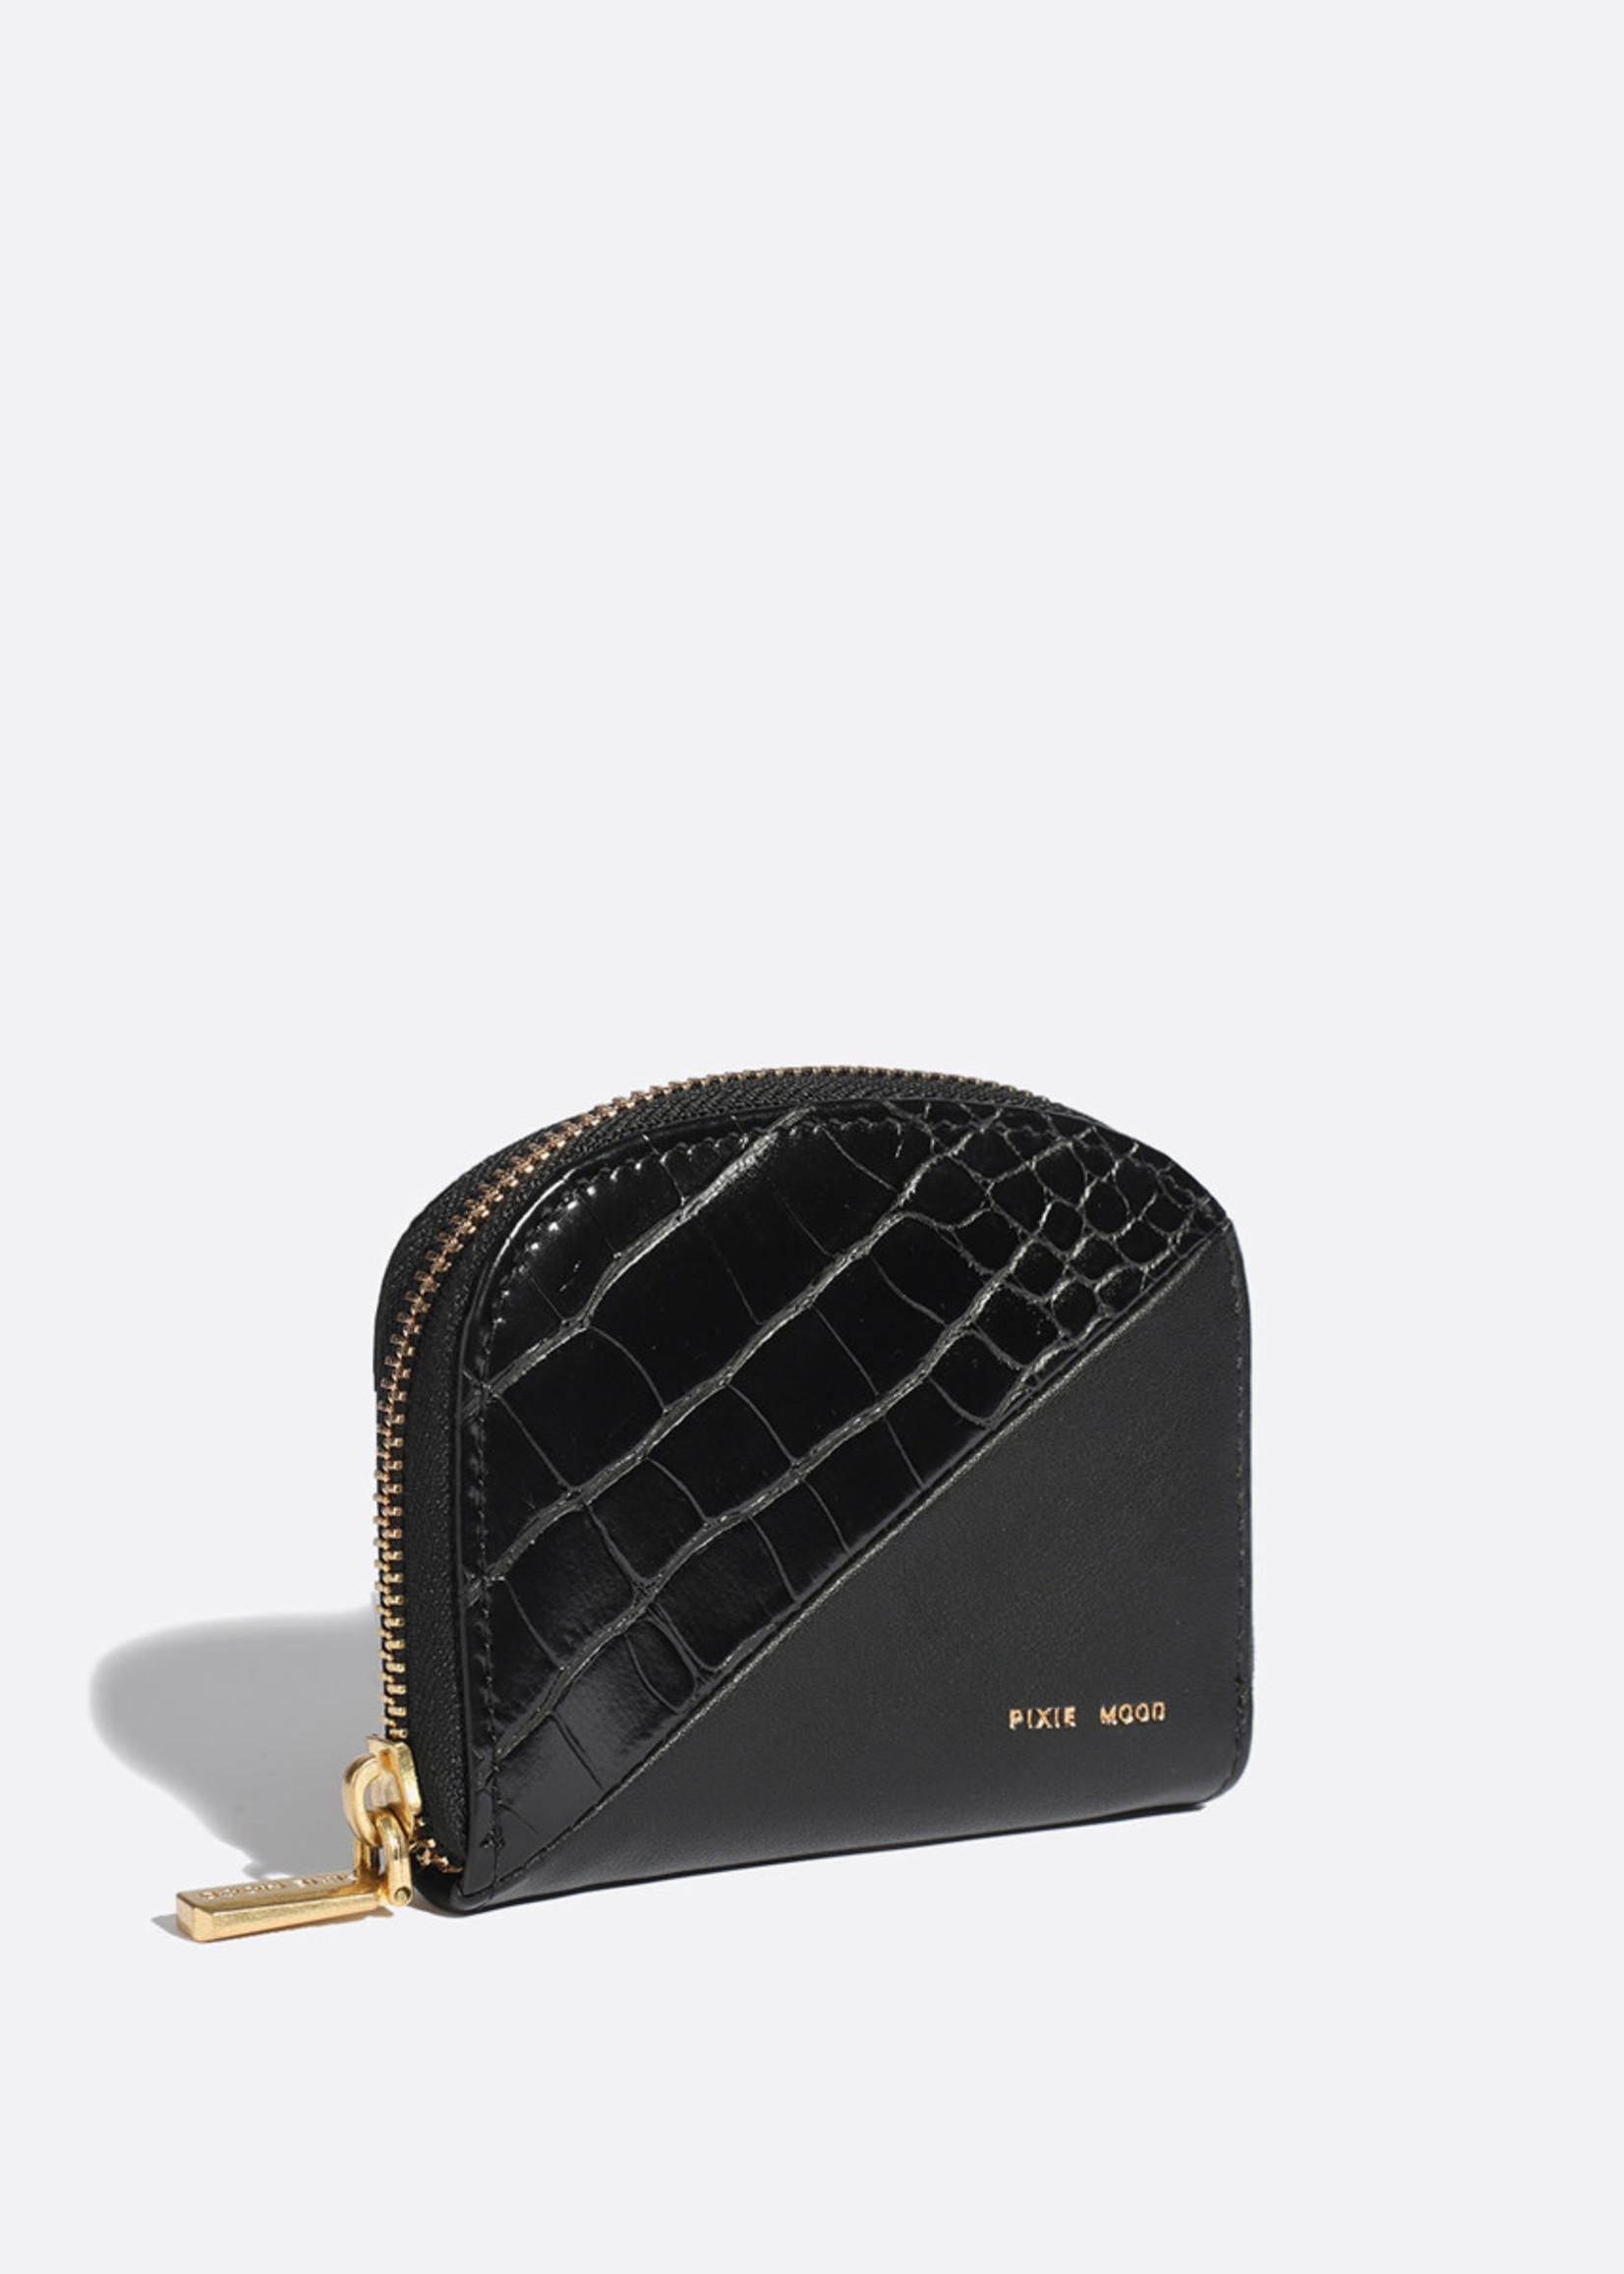 PIXIE MOOD Ida Card Case BLACK CROC/BLACK